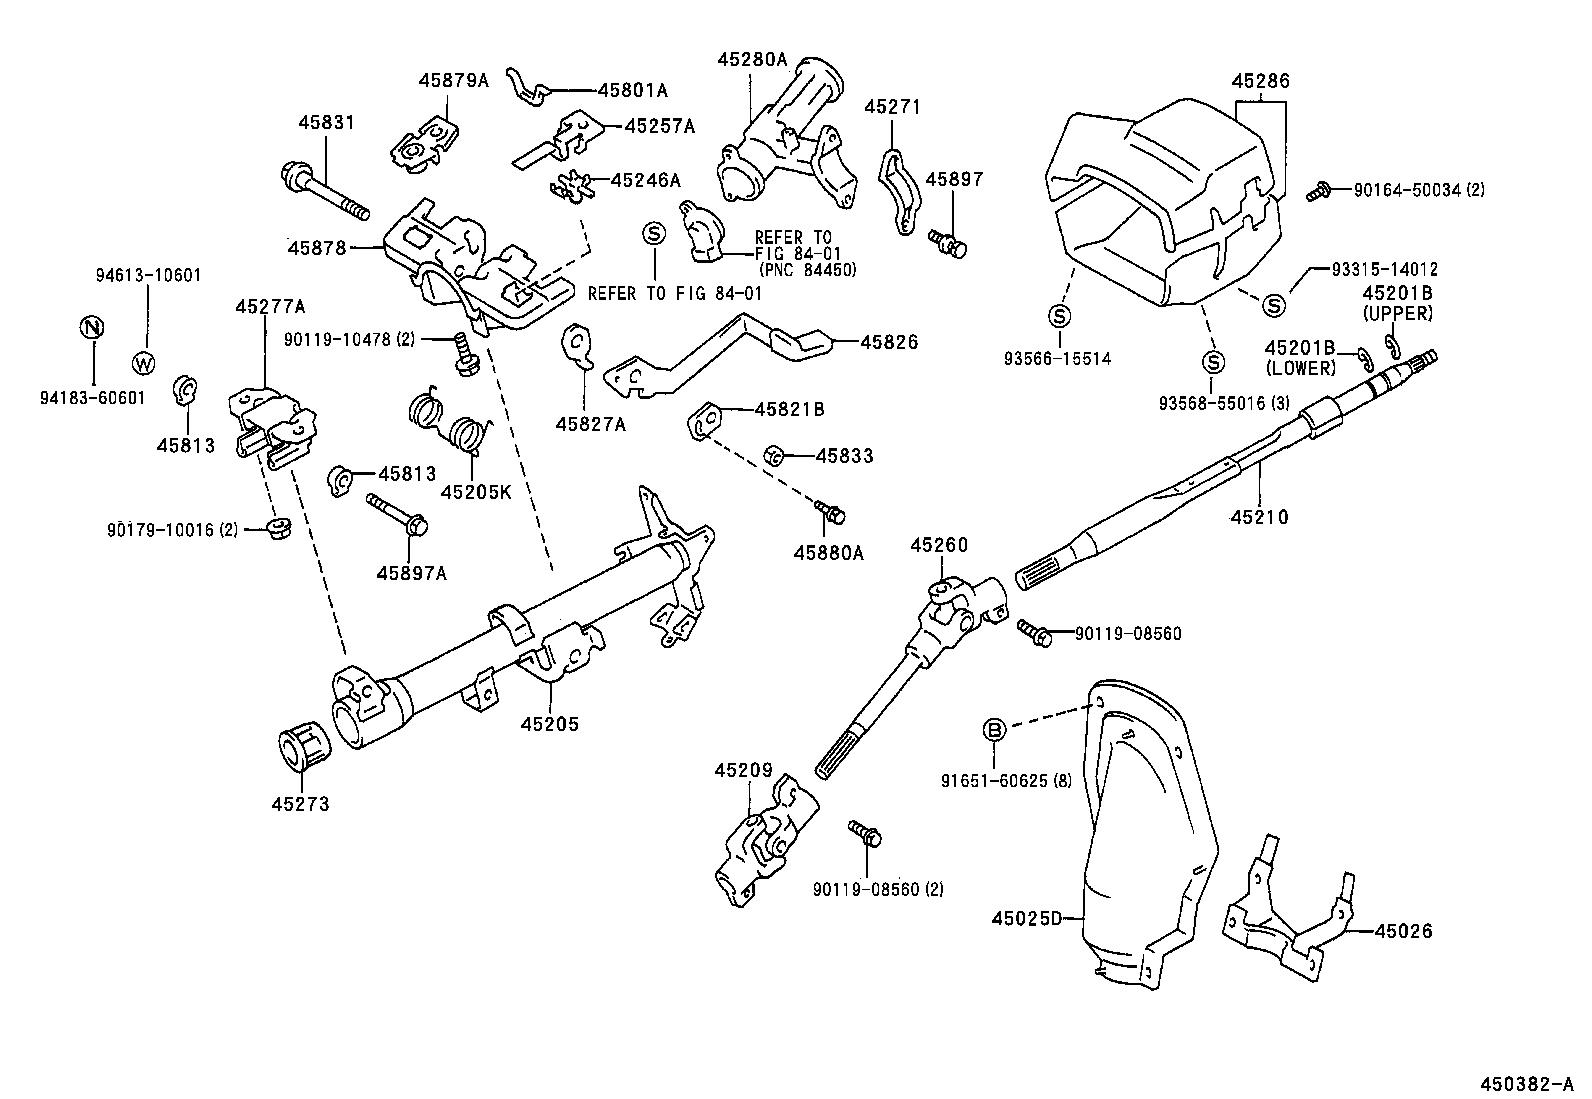 hight resolution of corolla steering diagram wiring diagram yer toyota corolla steering rack diagram corolla steering diagram